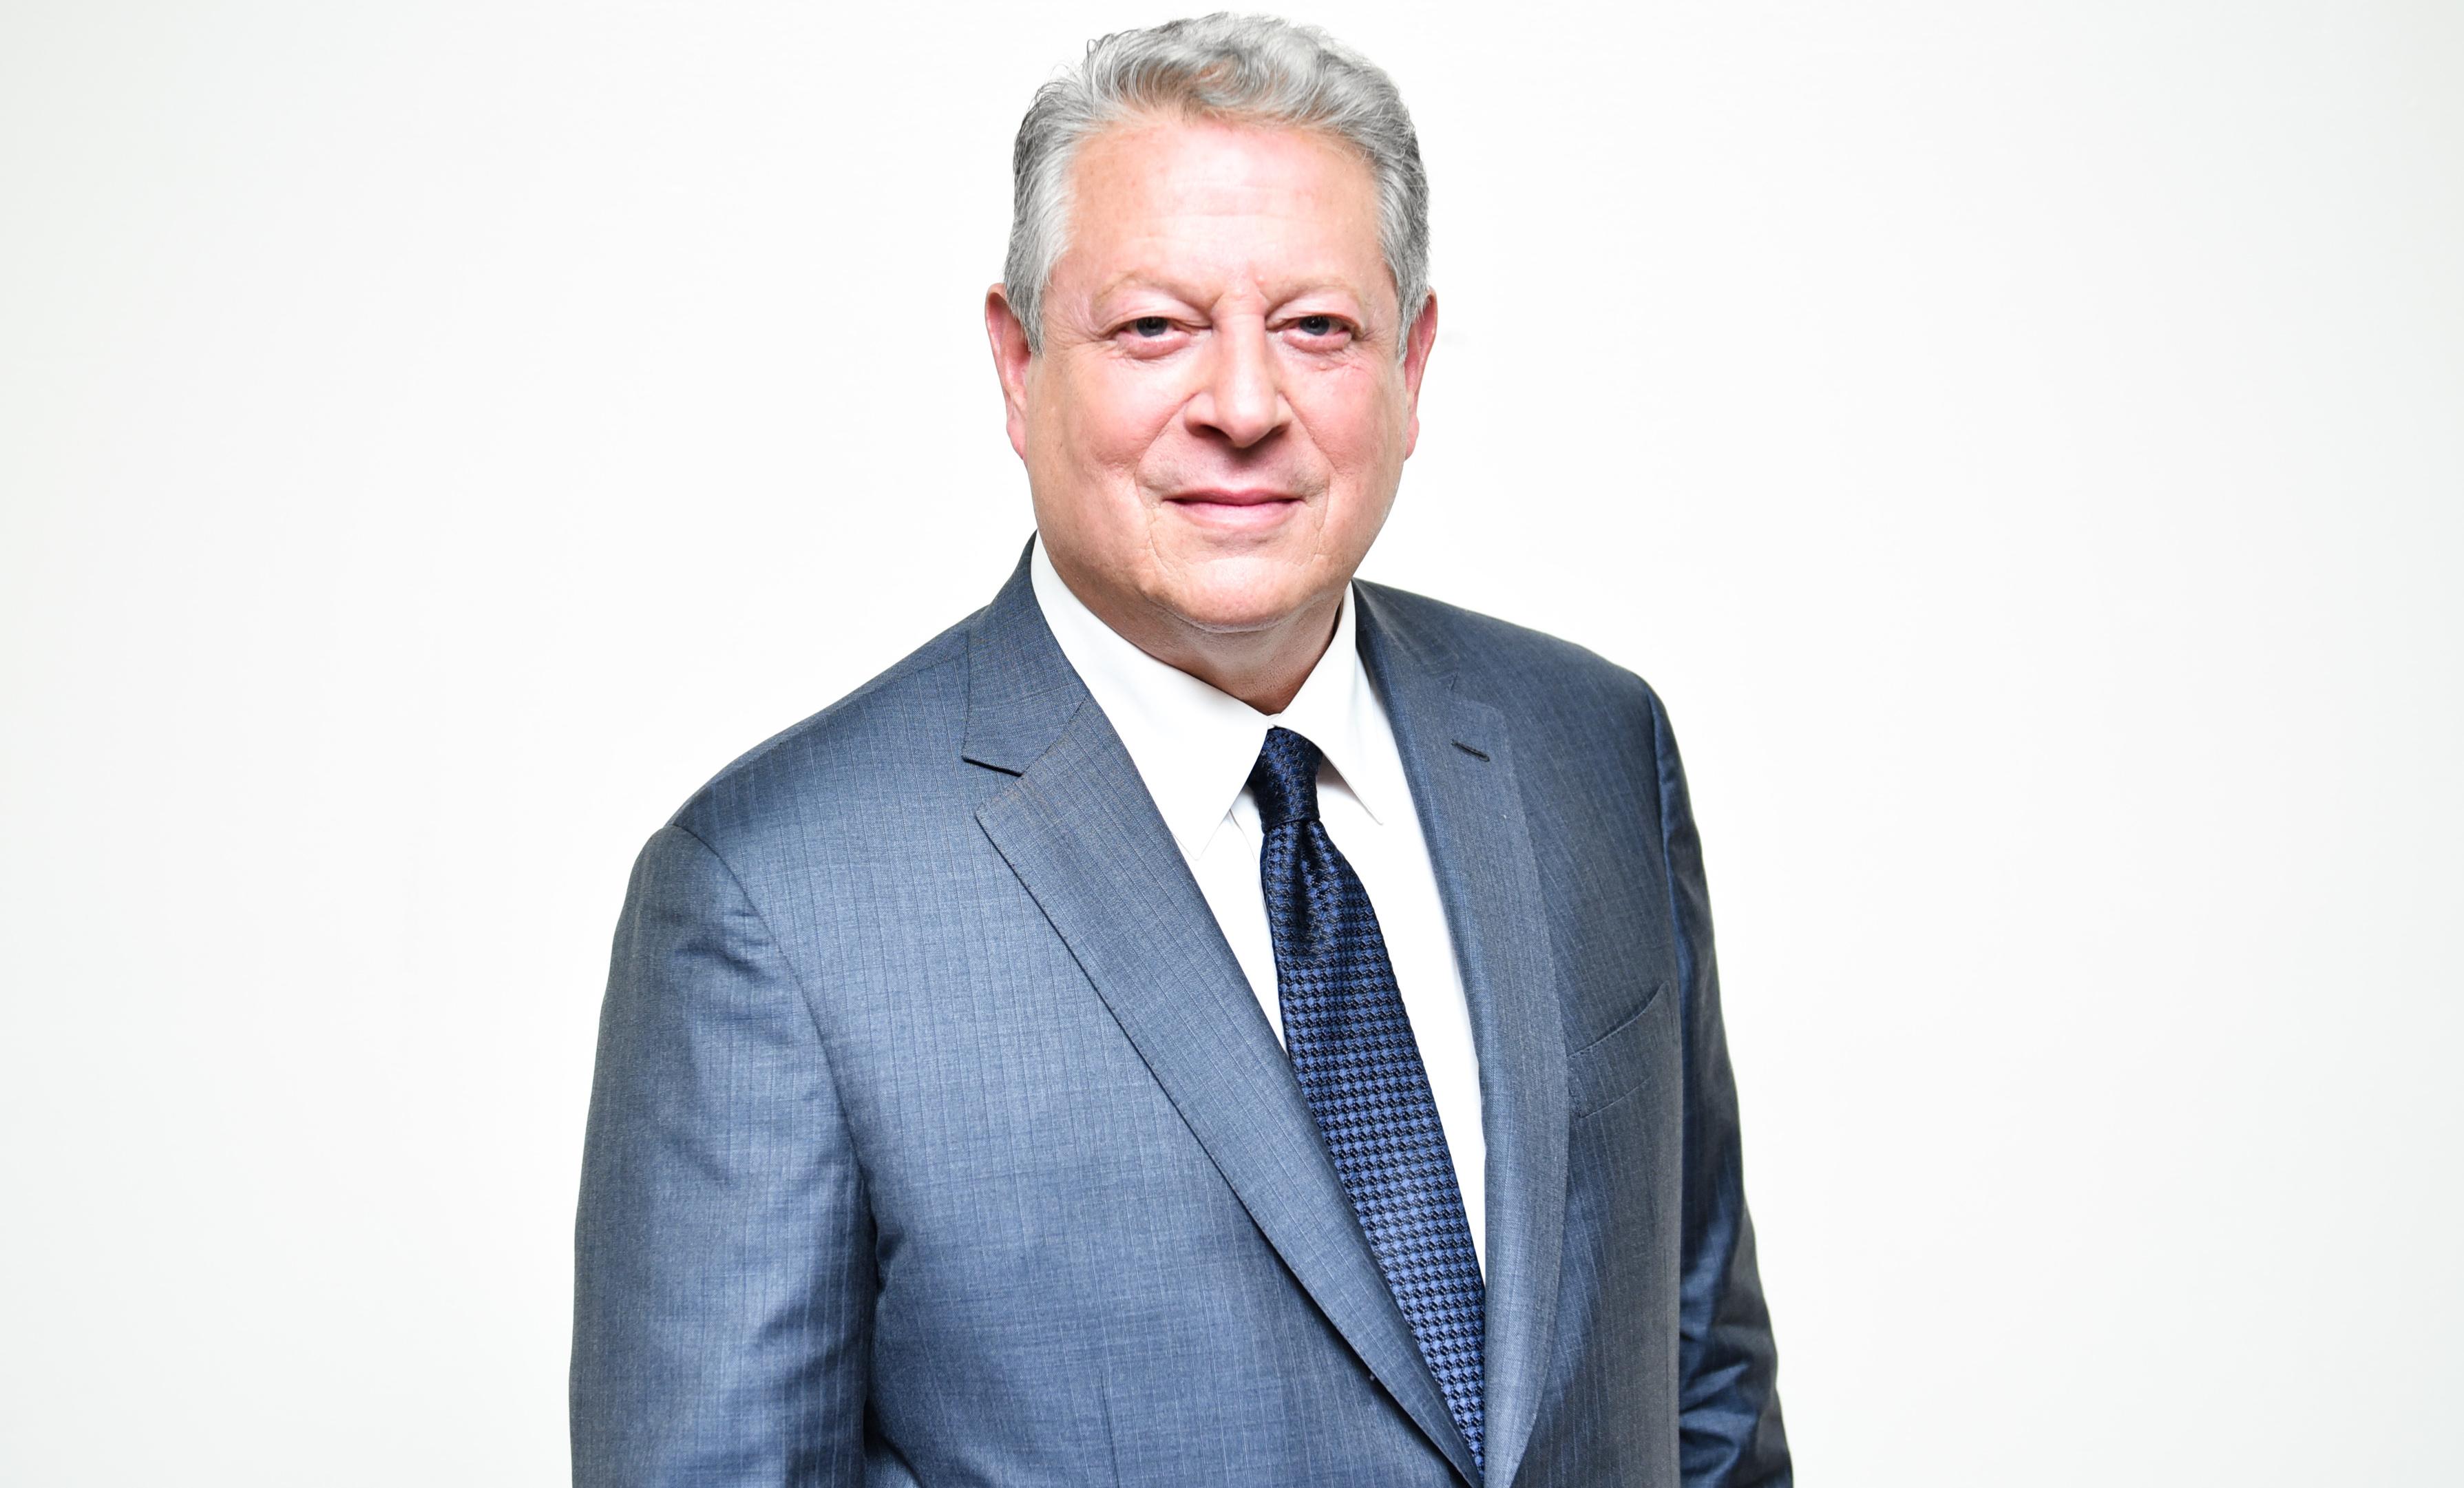 Al Gore portrait